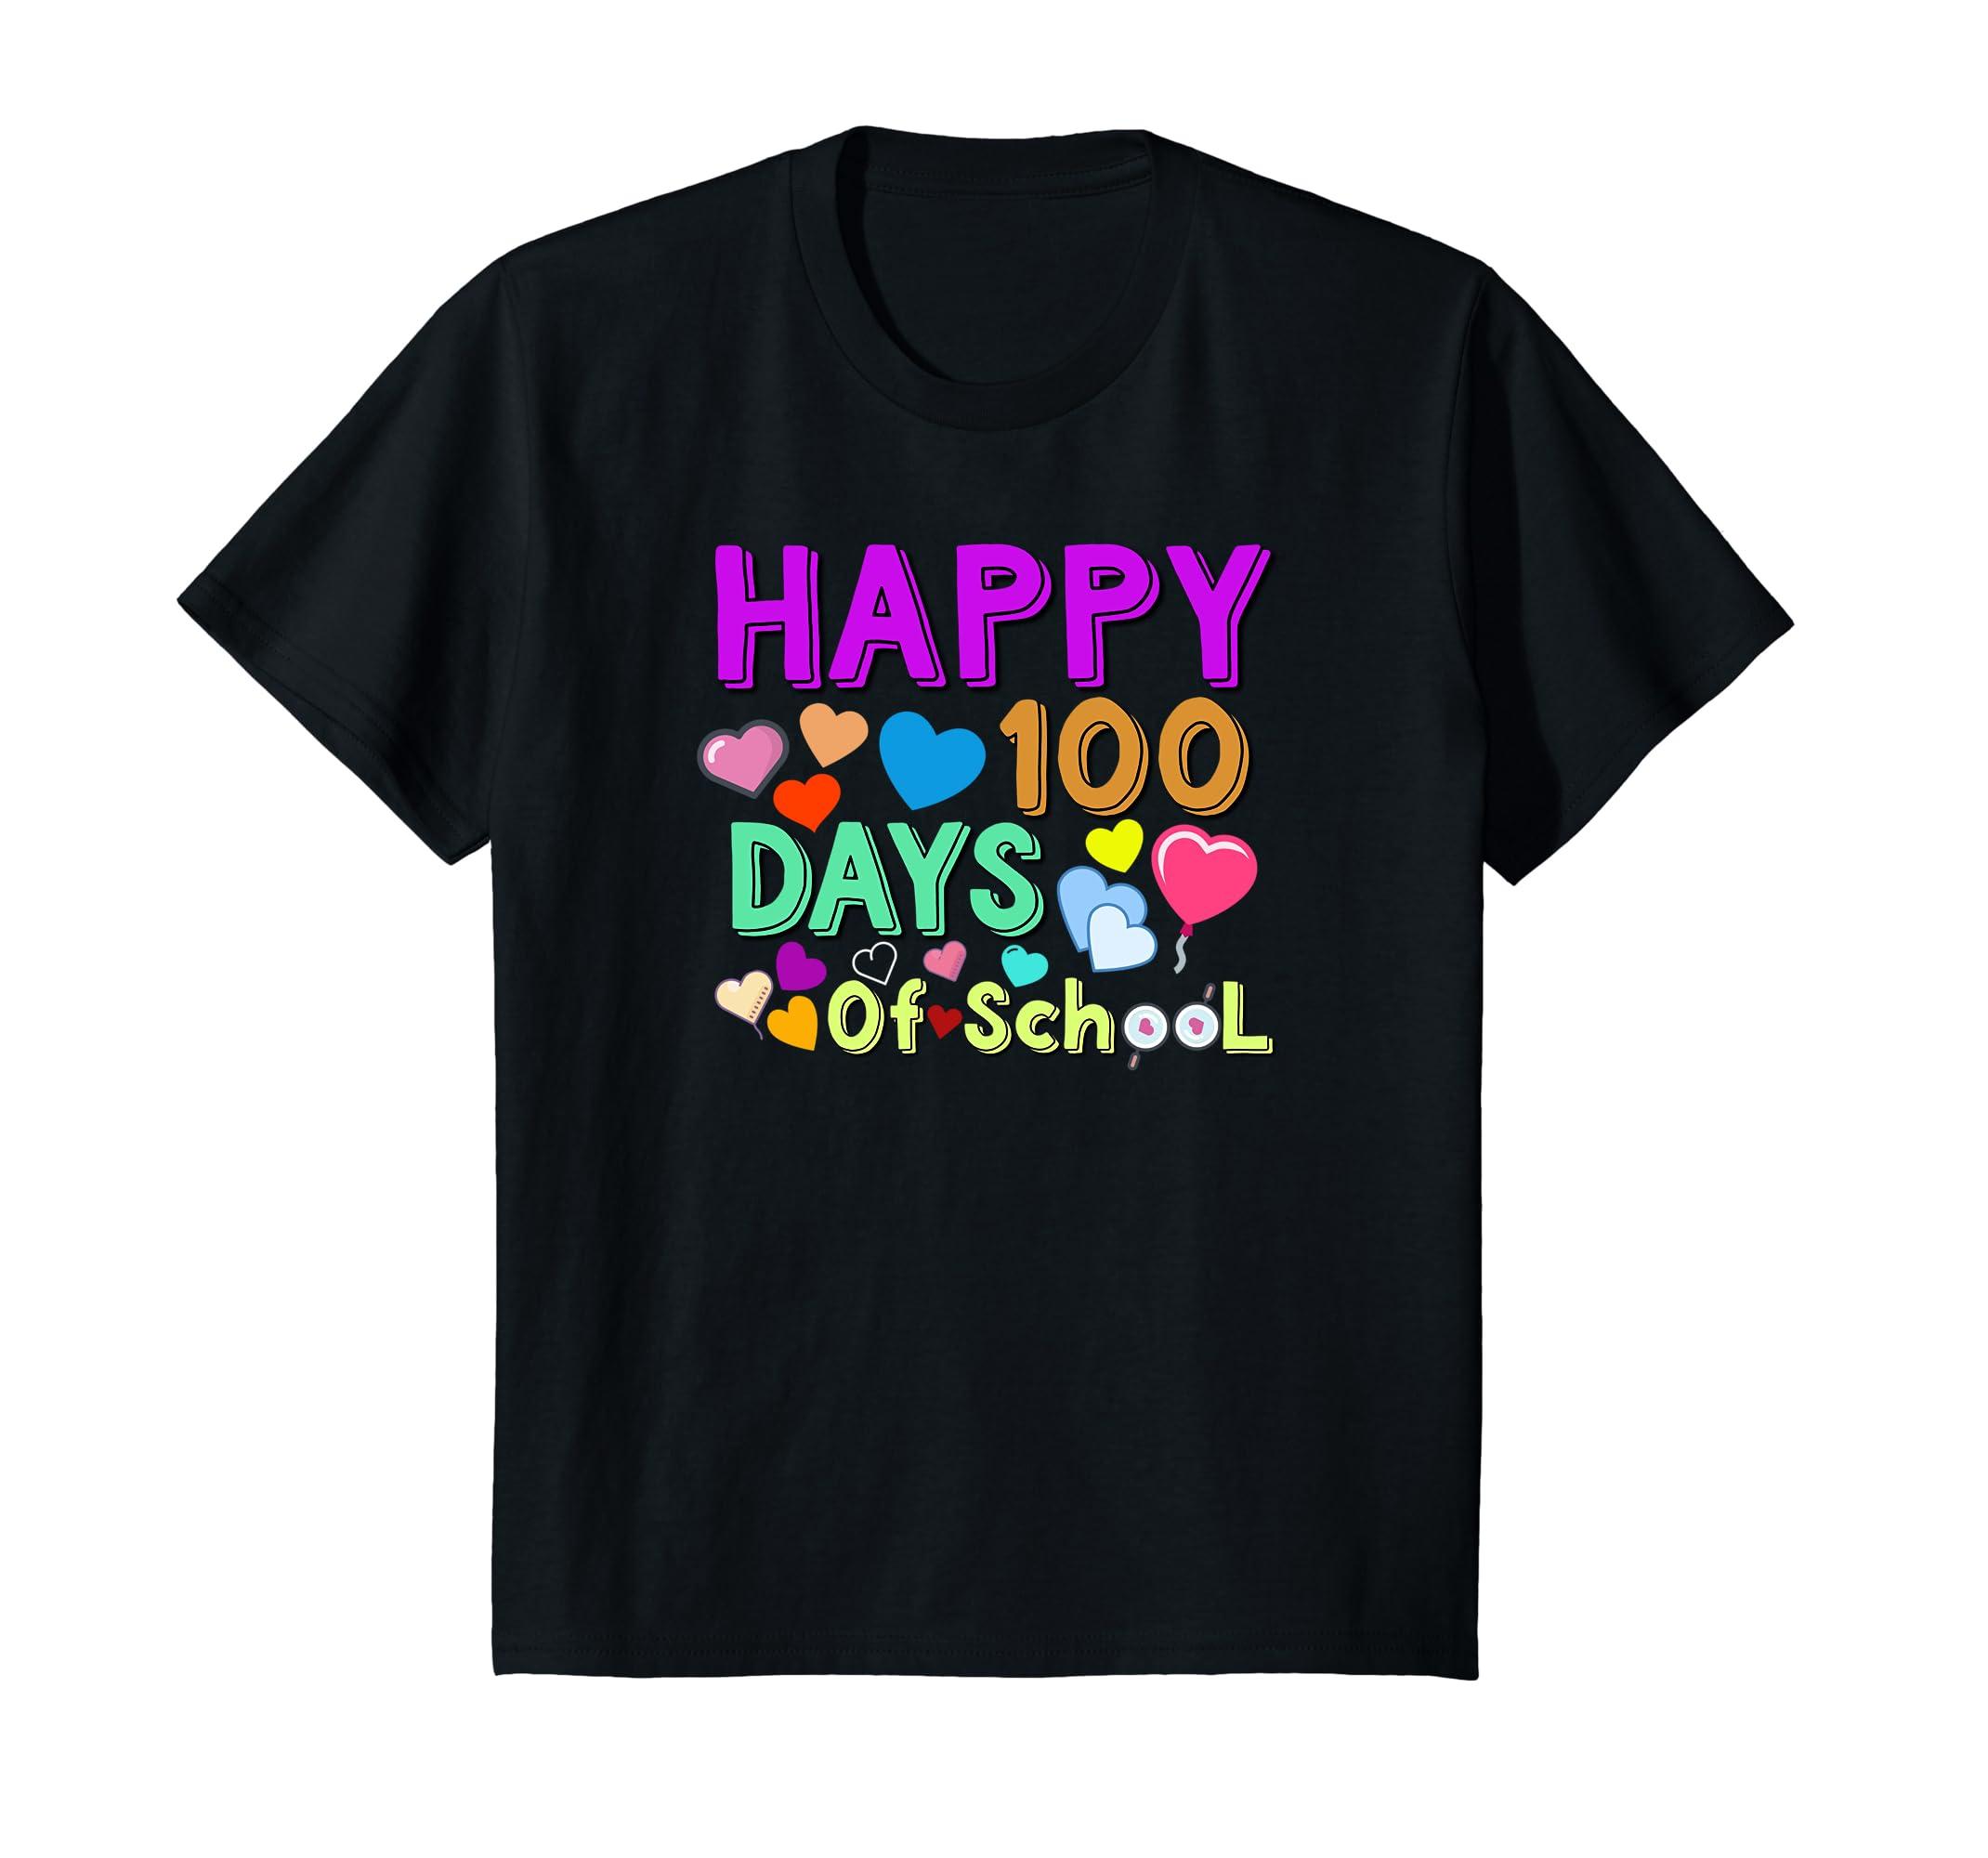 100th Day of School Shirt  Happy 100 Days Of School T-shirt